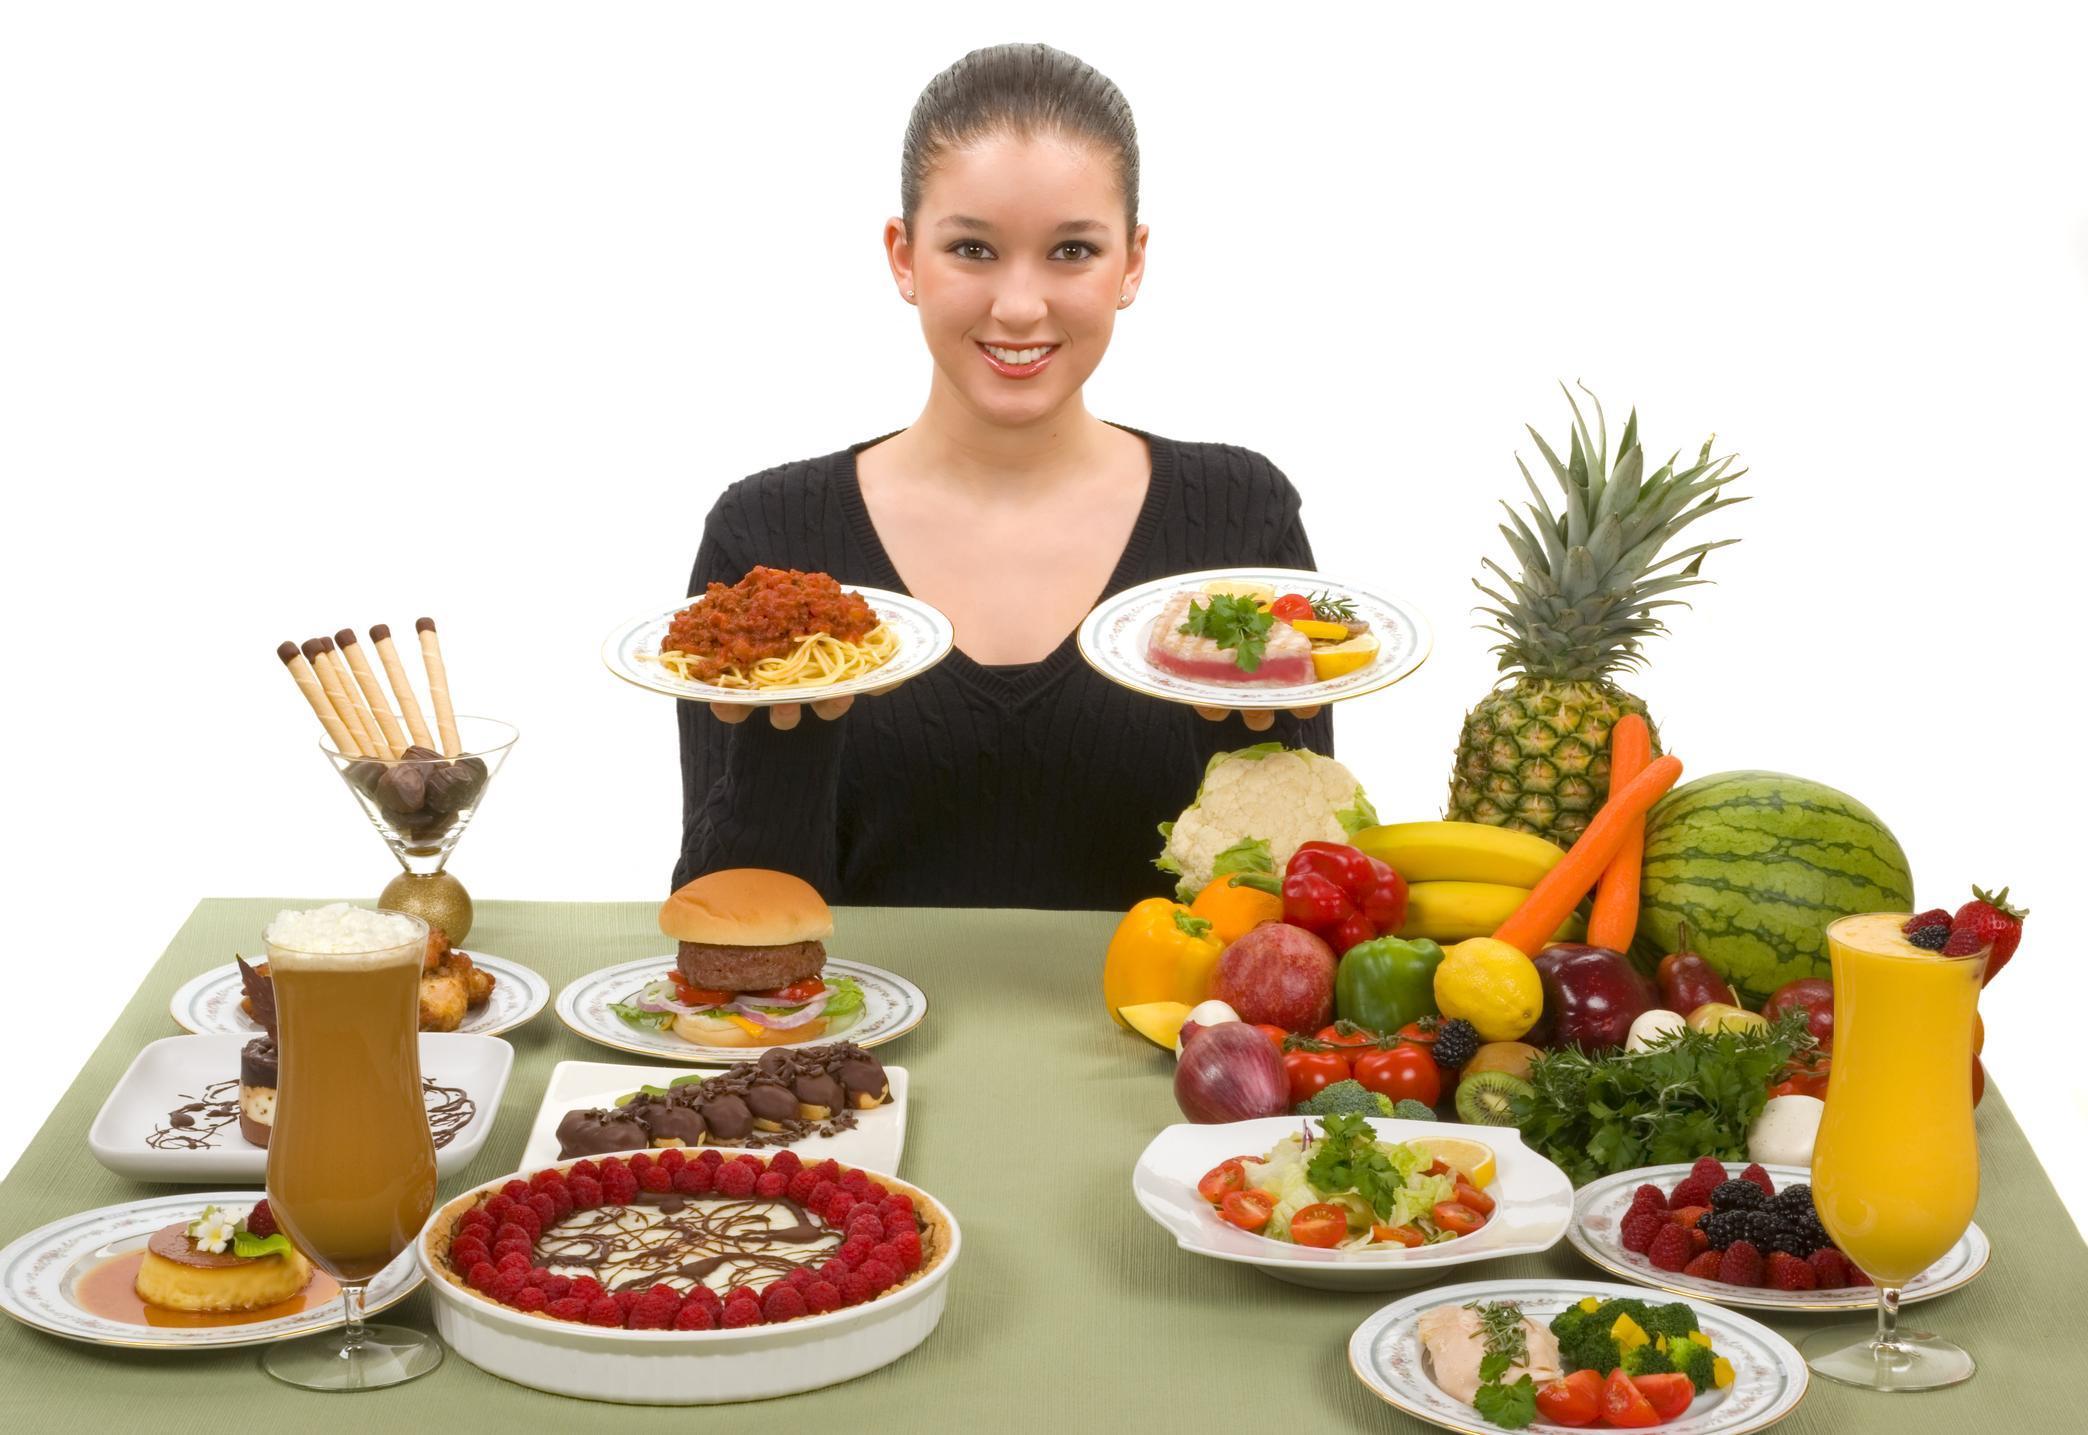 7. Binge Eating